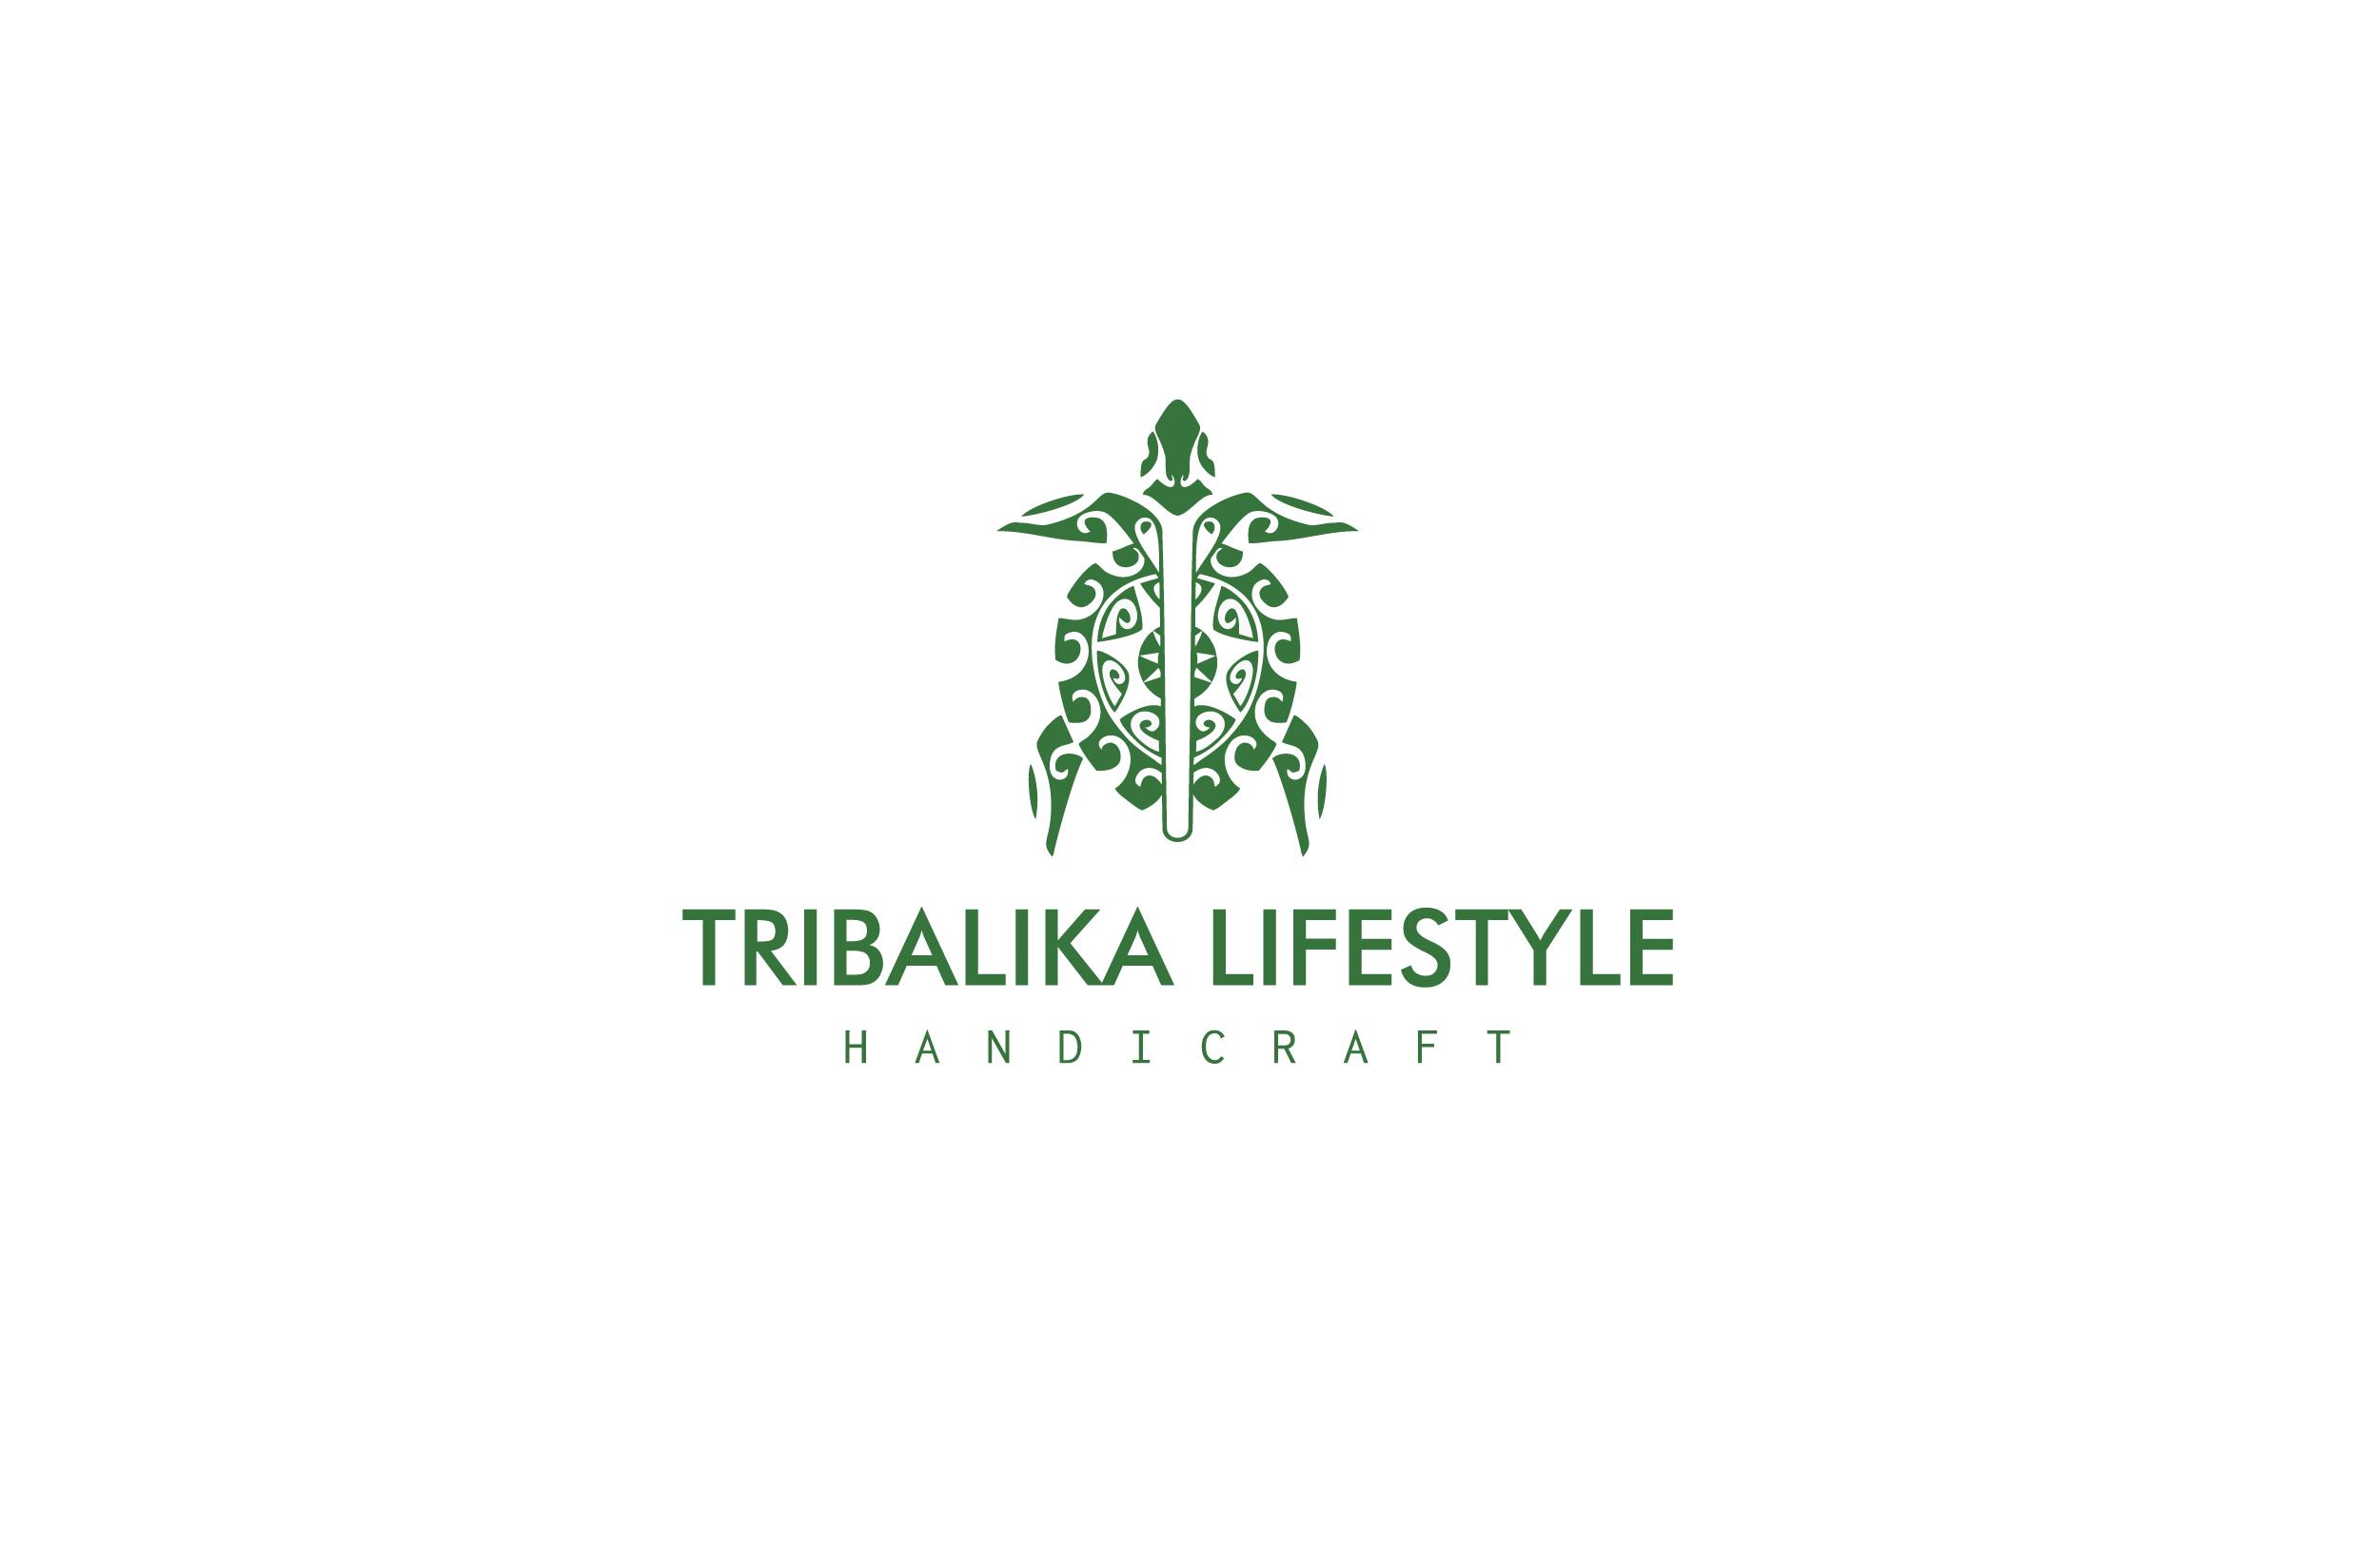 TRIBALIKA LIFESTYLE OPC PVT. LTD.